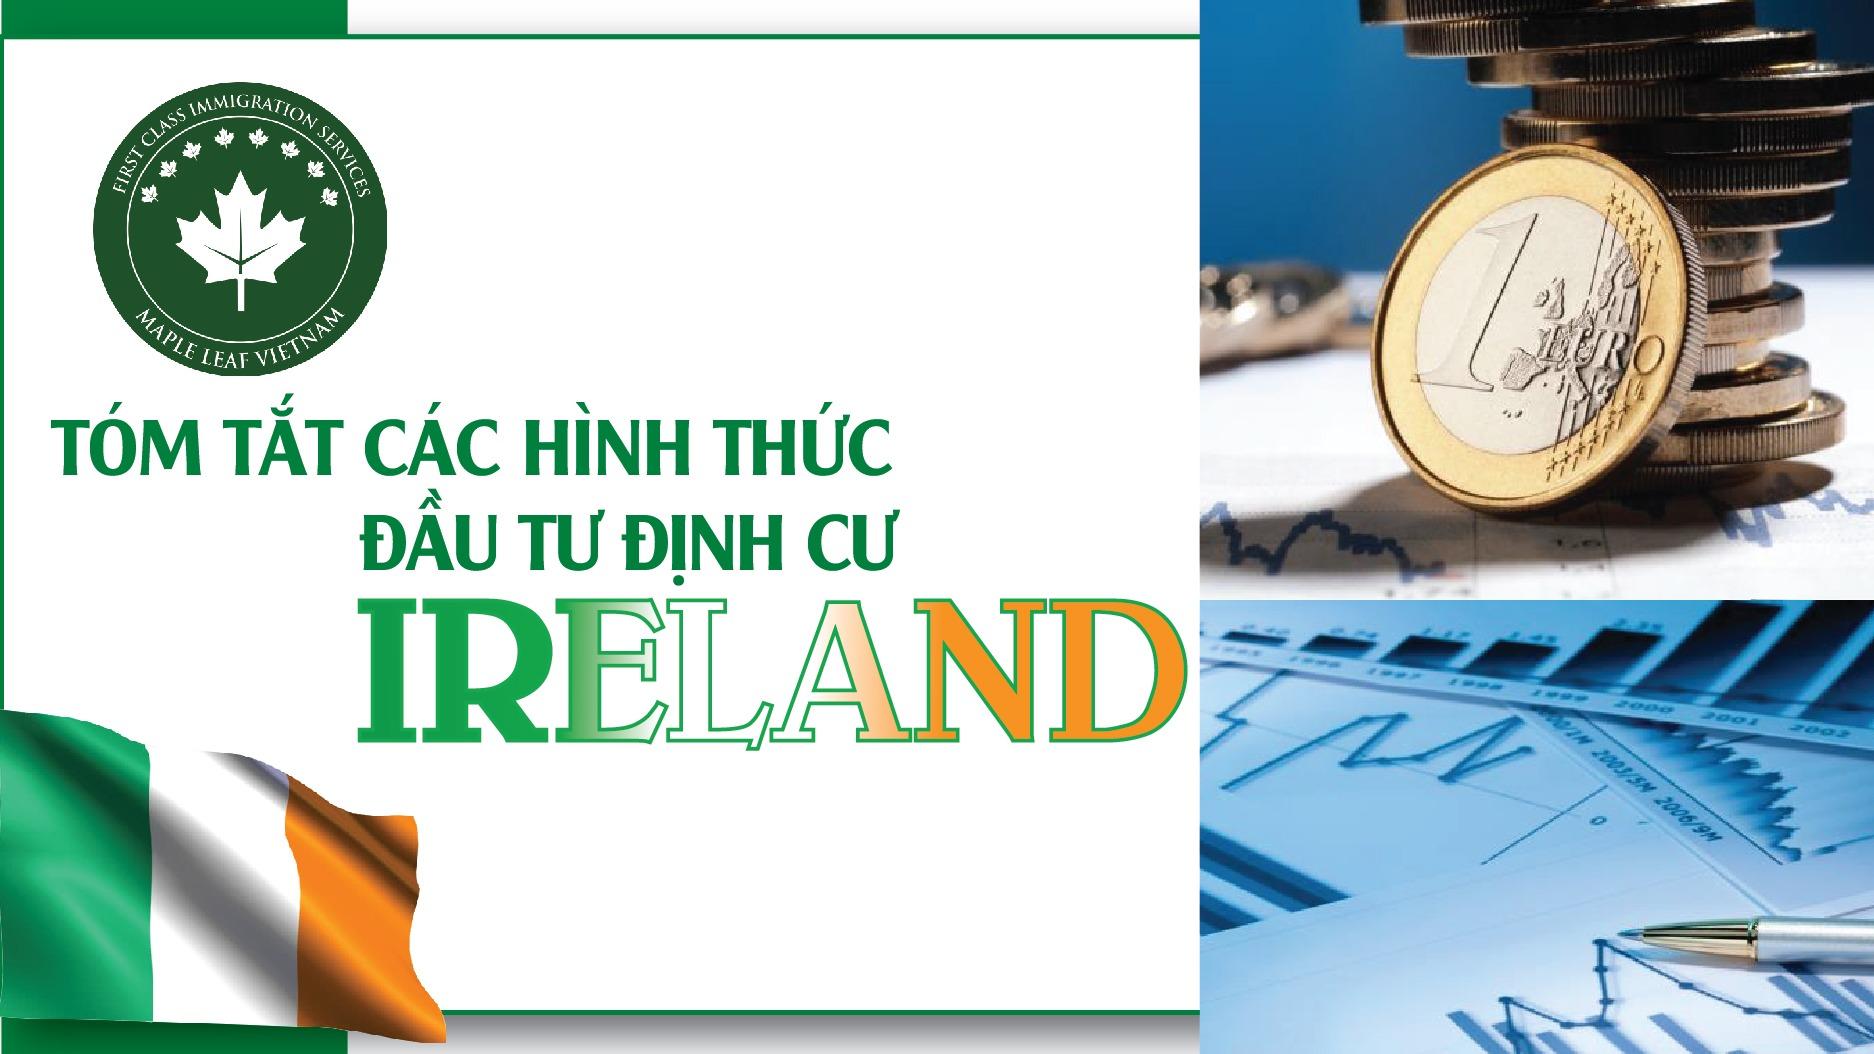 tom-tat-cac-hinh-thuc-dau-tu-ireland-ai-len